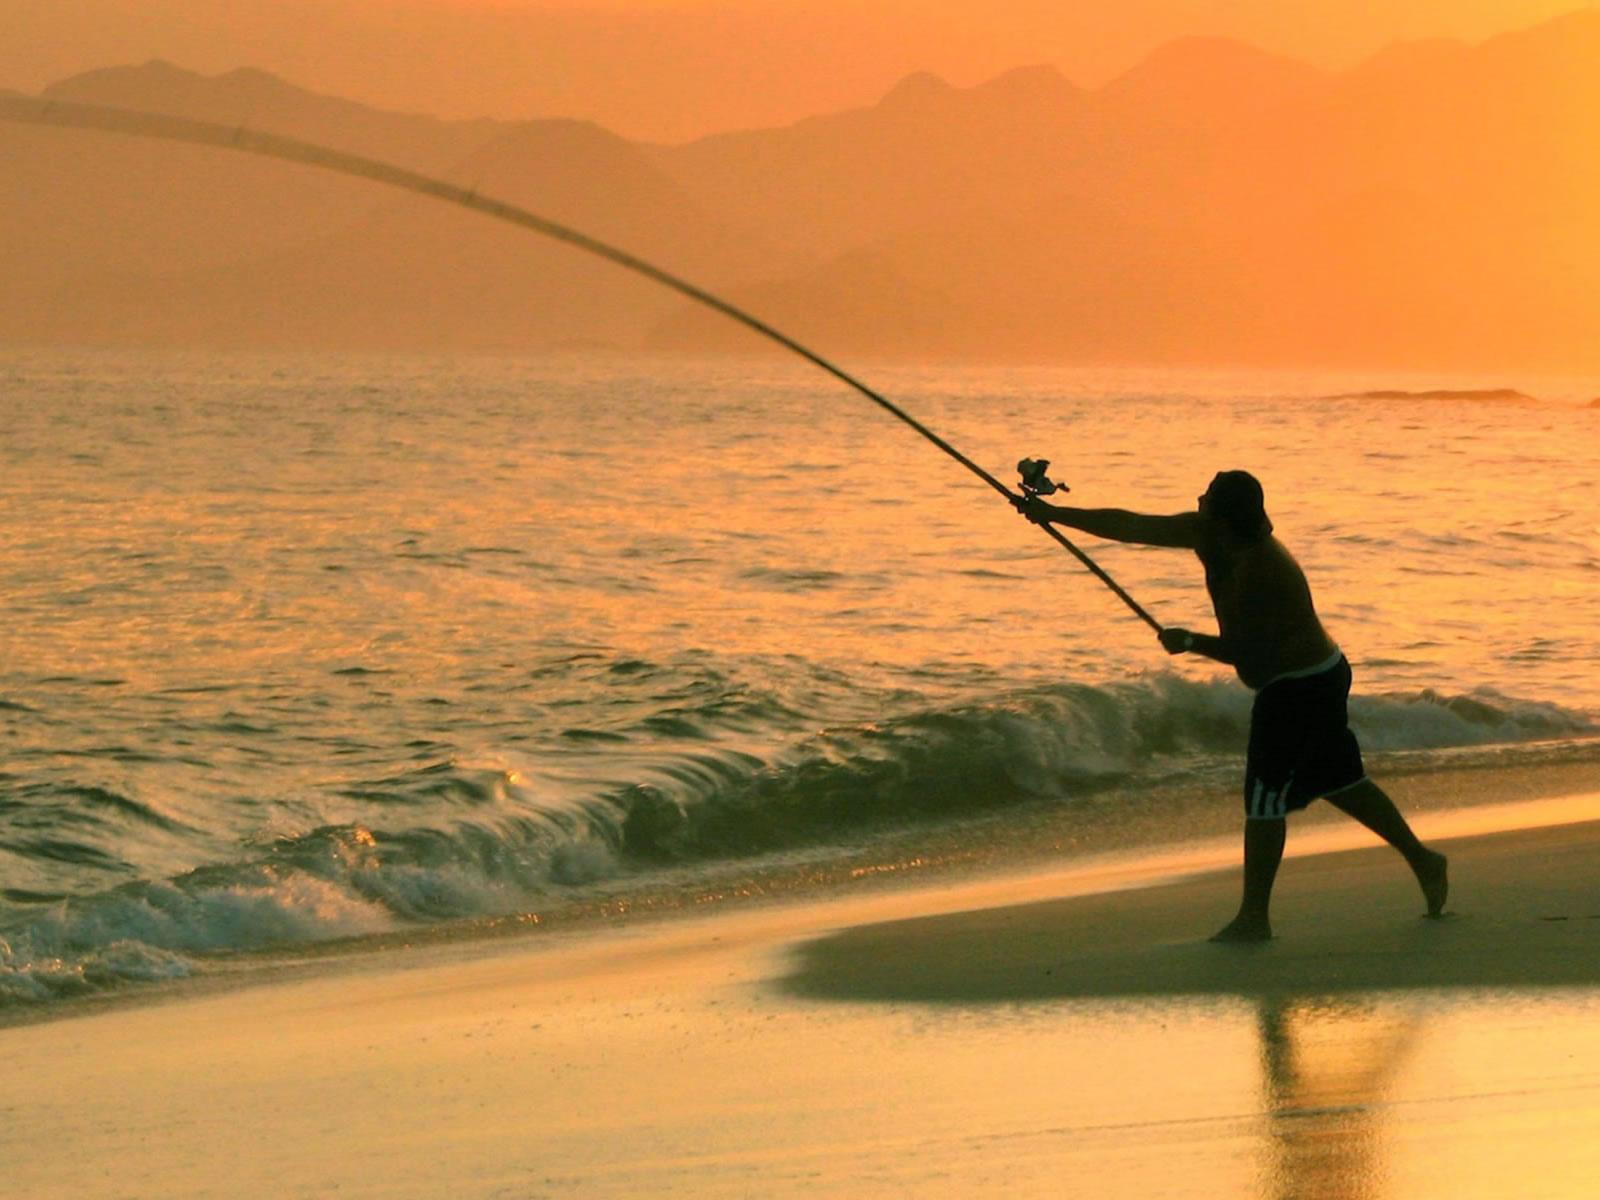 com 2012 06 fishing wallpaper 2012 html filesize 1209x806 313k 1600x1200